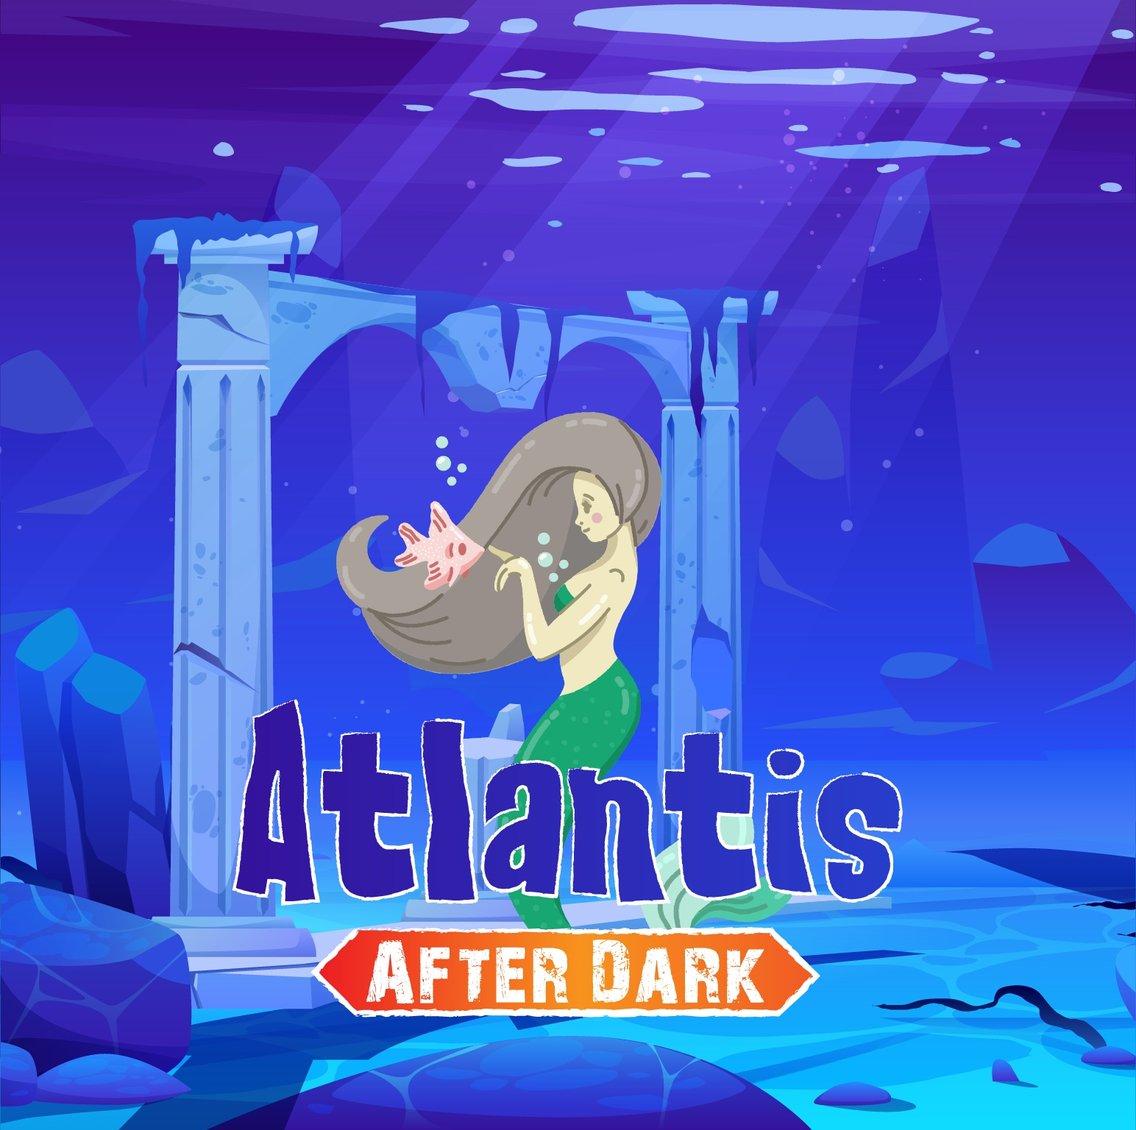 Atlantis After Dark - Cover Image